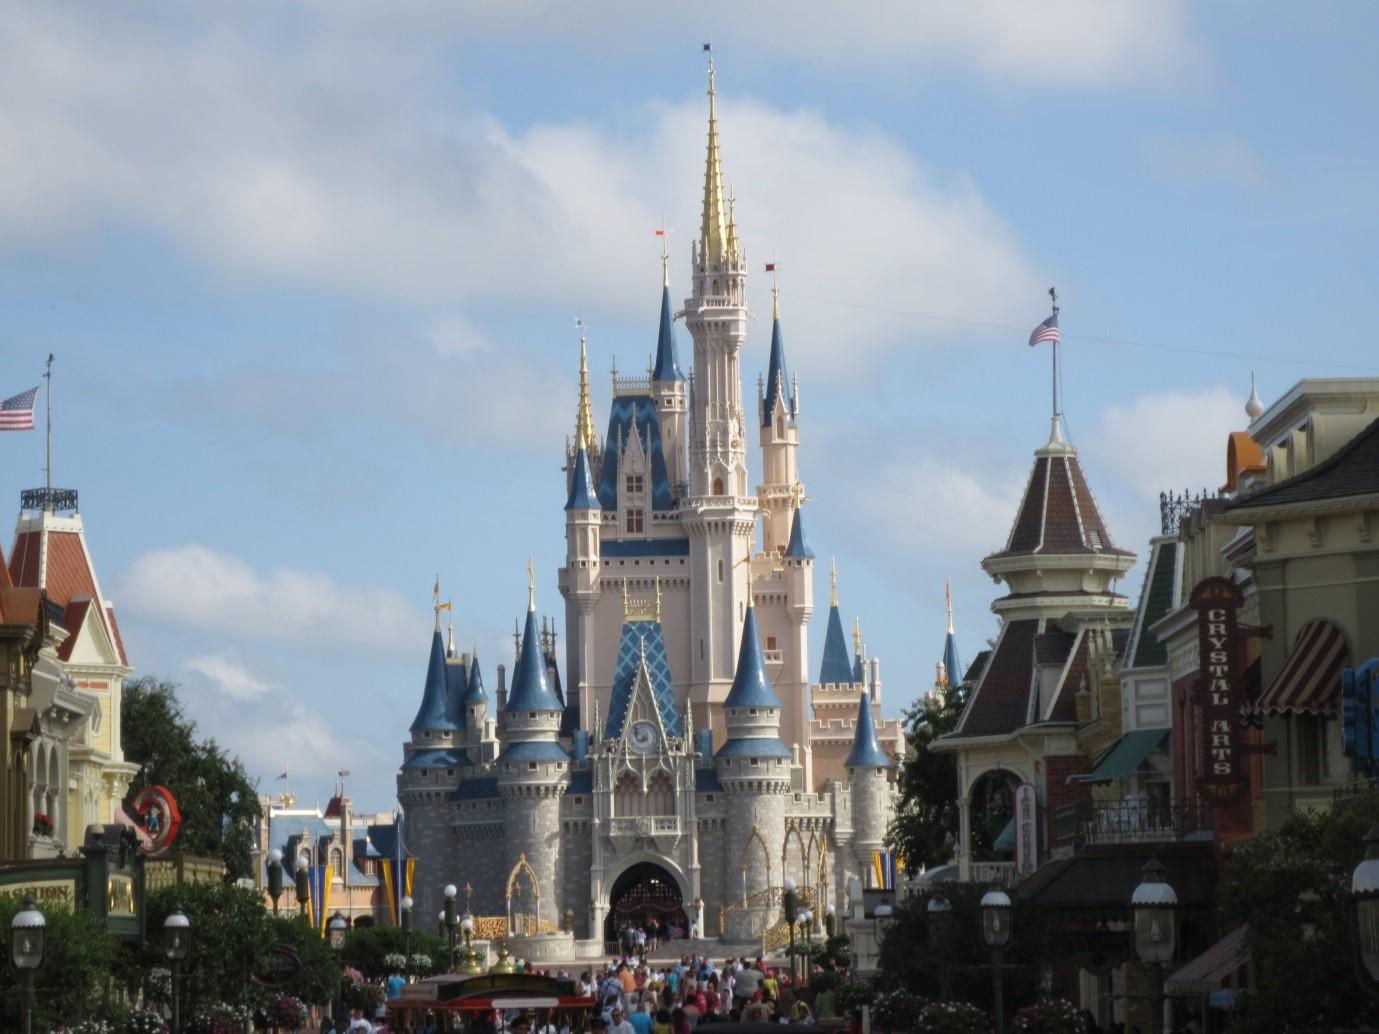 Disney Castle at Magic Kingdom, Disney World, Orlando, Florida